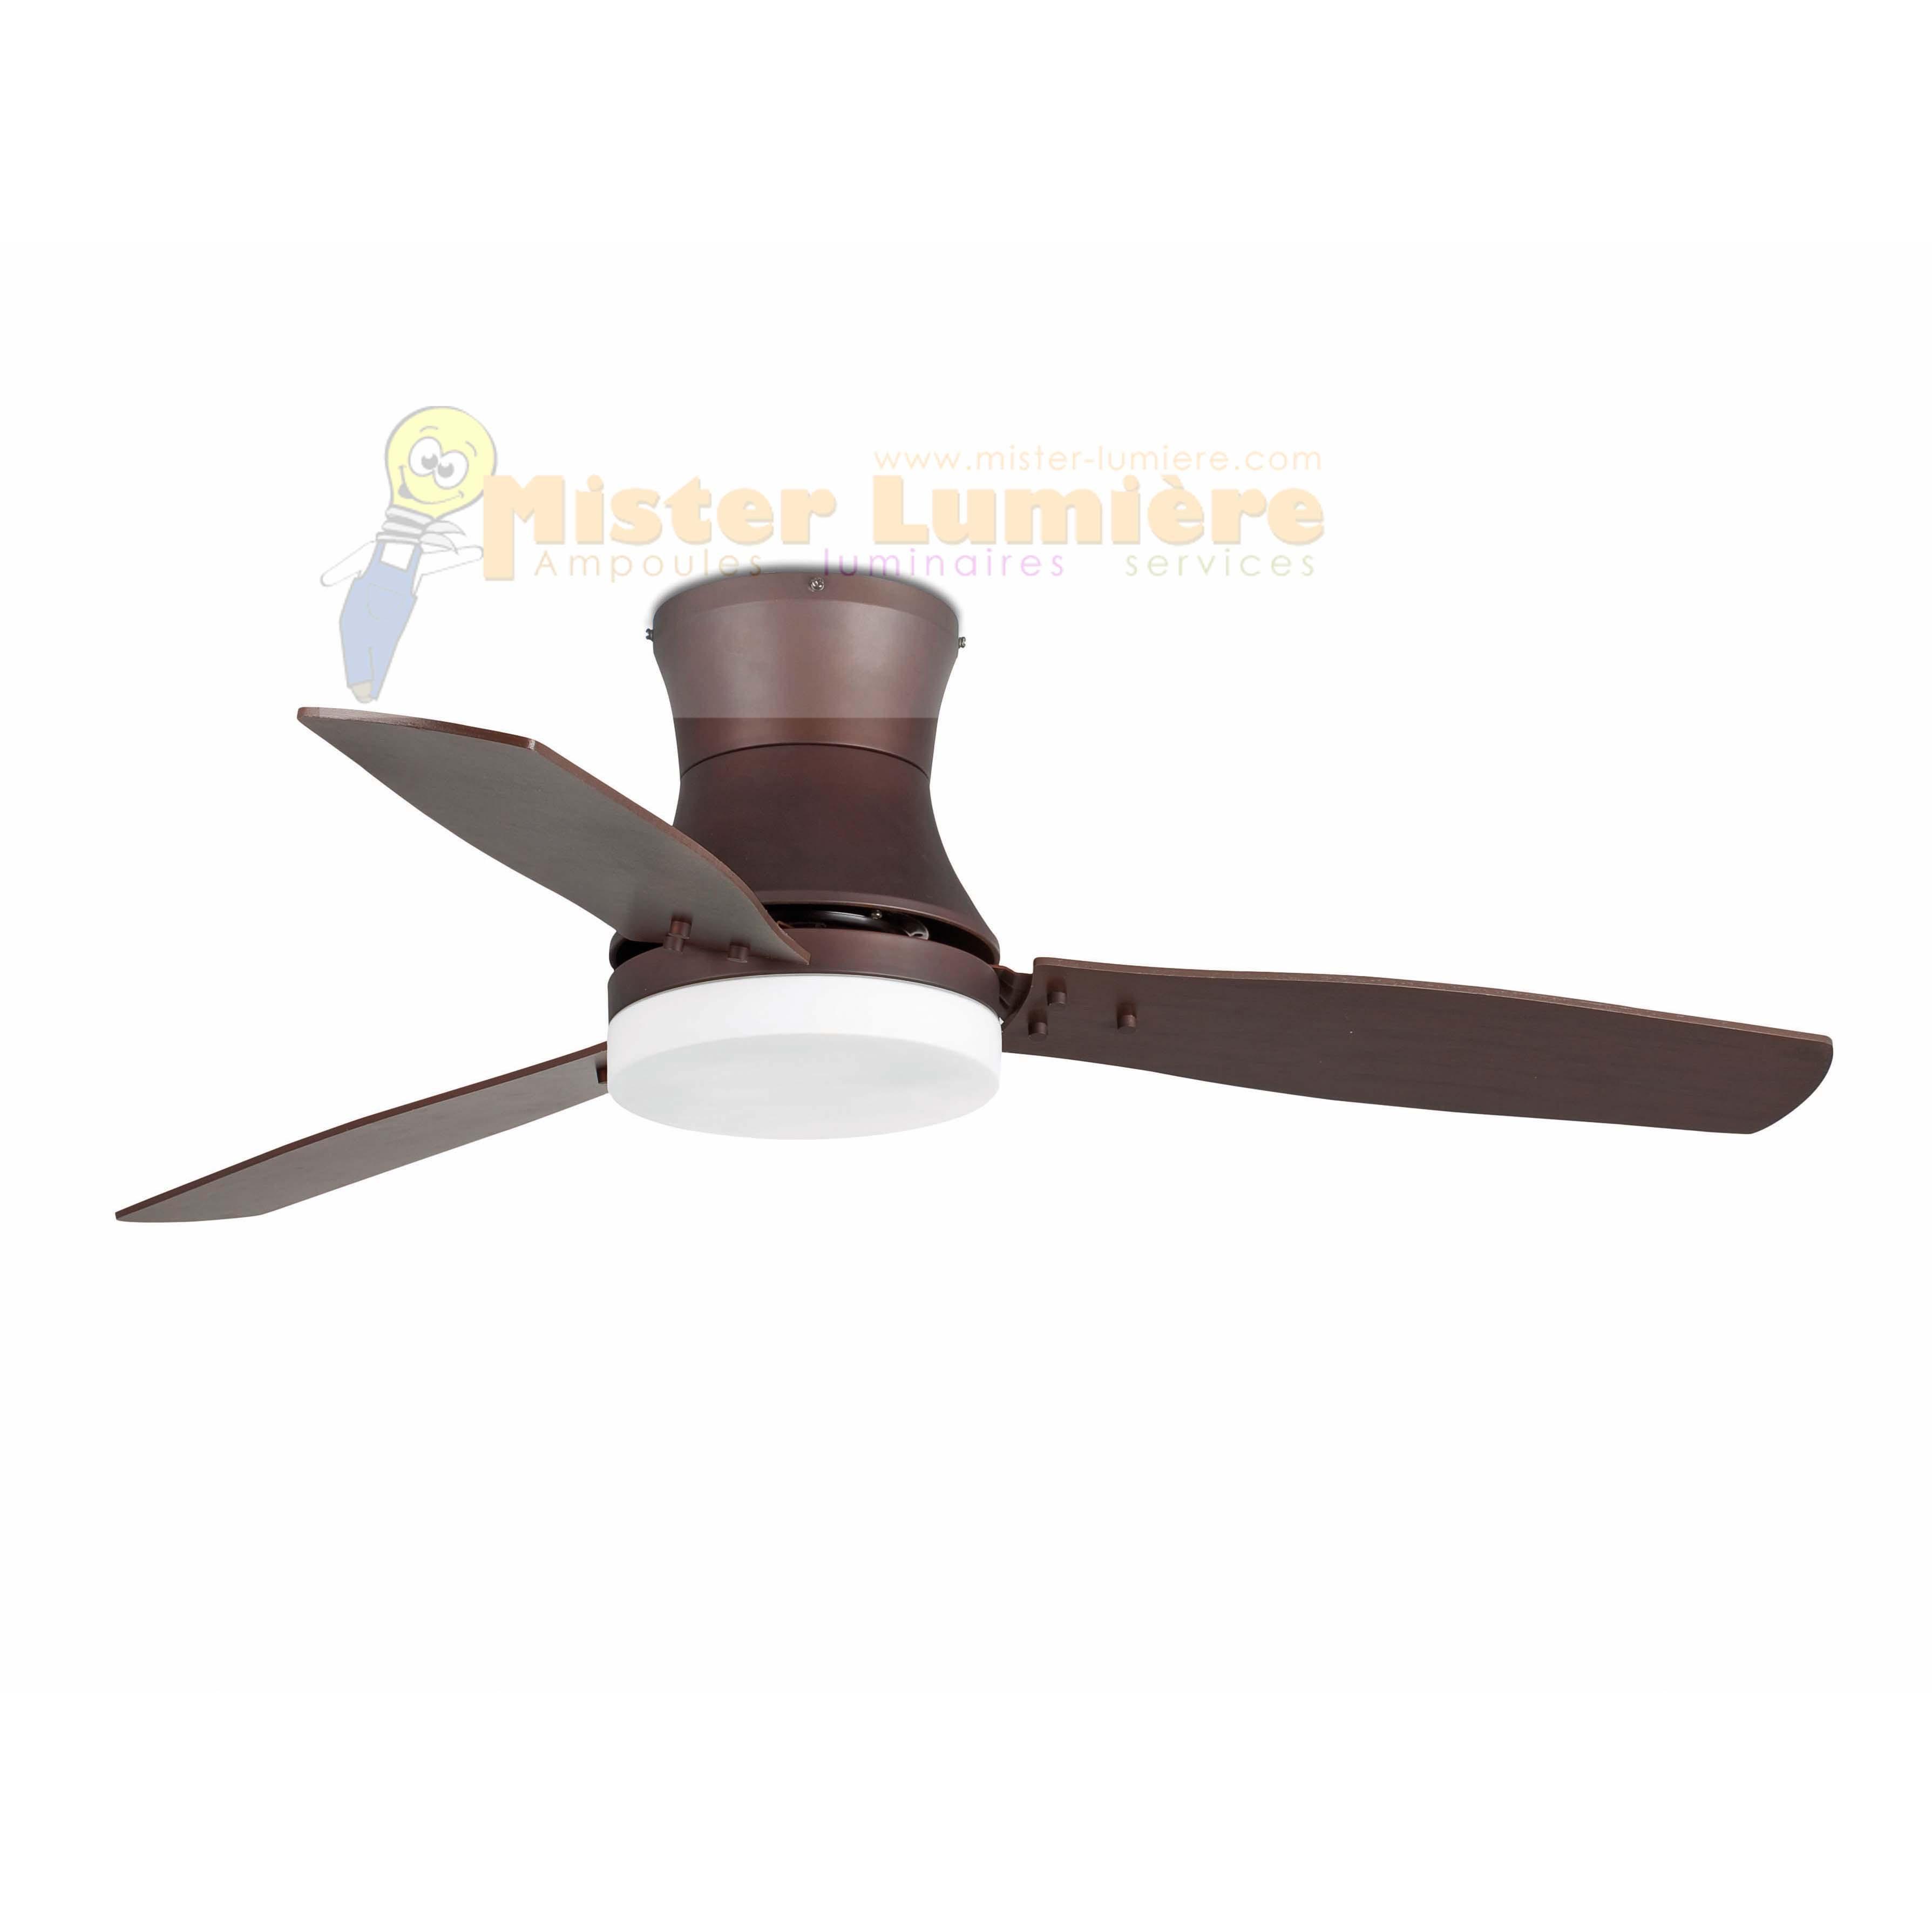 ventilateur de plafond lumineux TONSAY marron